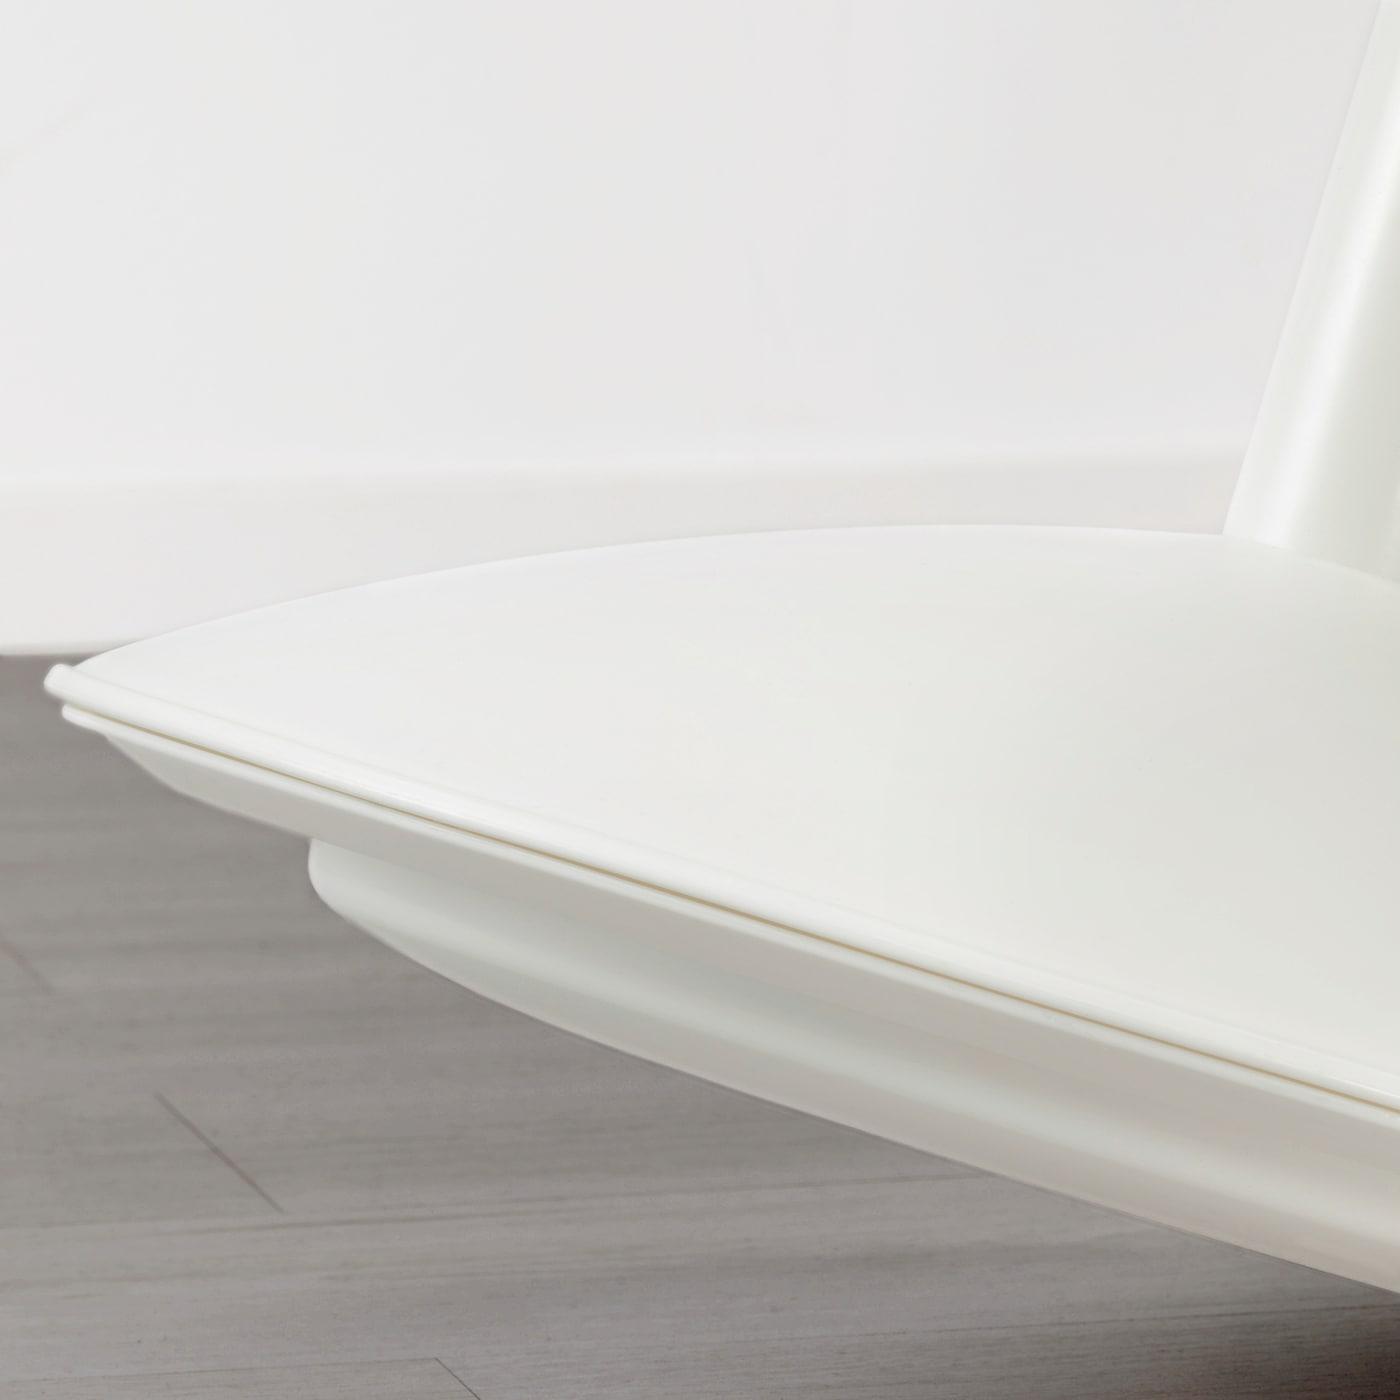 Ikea Nilserik Standing Support Sitting Stool Soft Seat Black White Vissle Grey